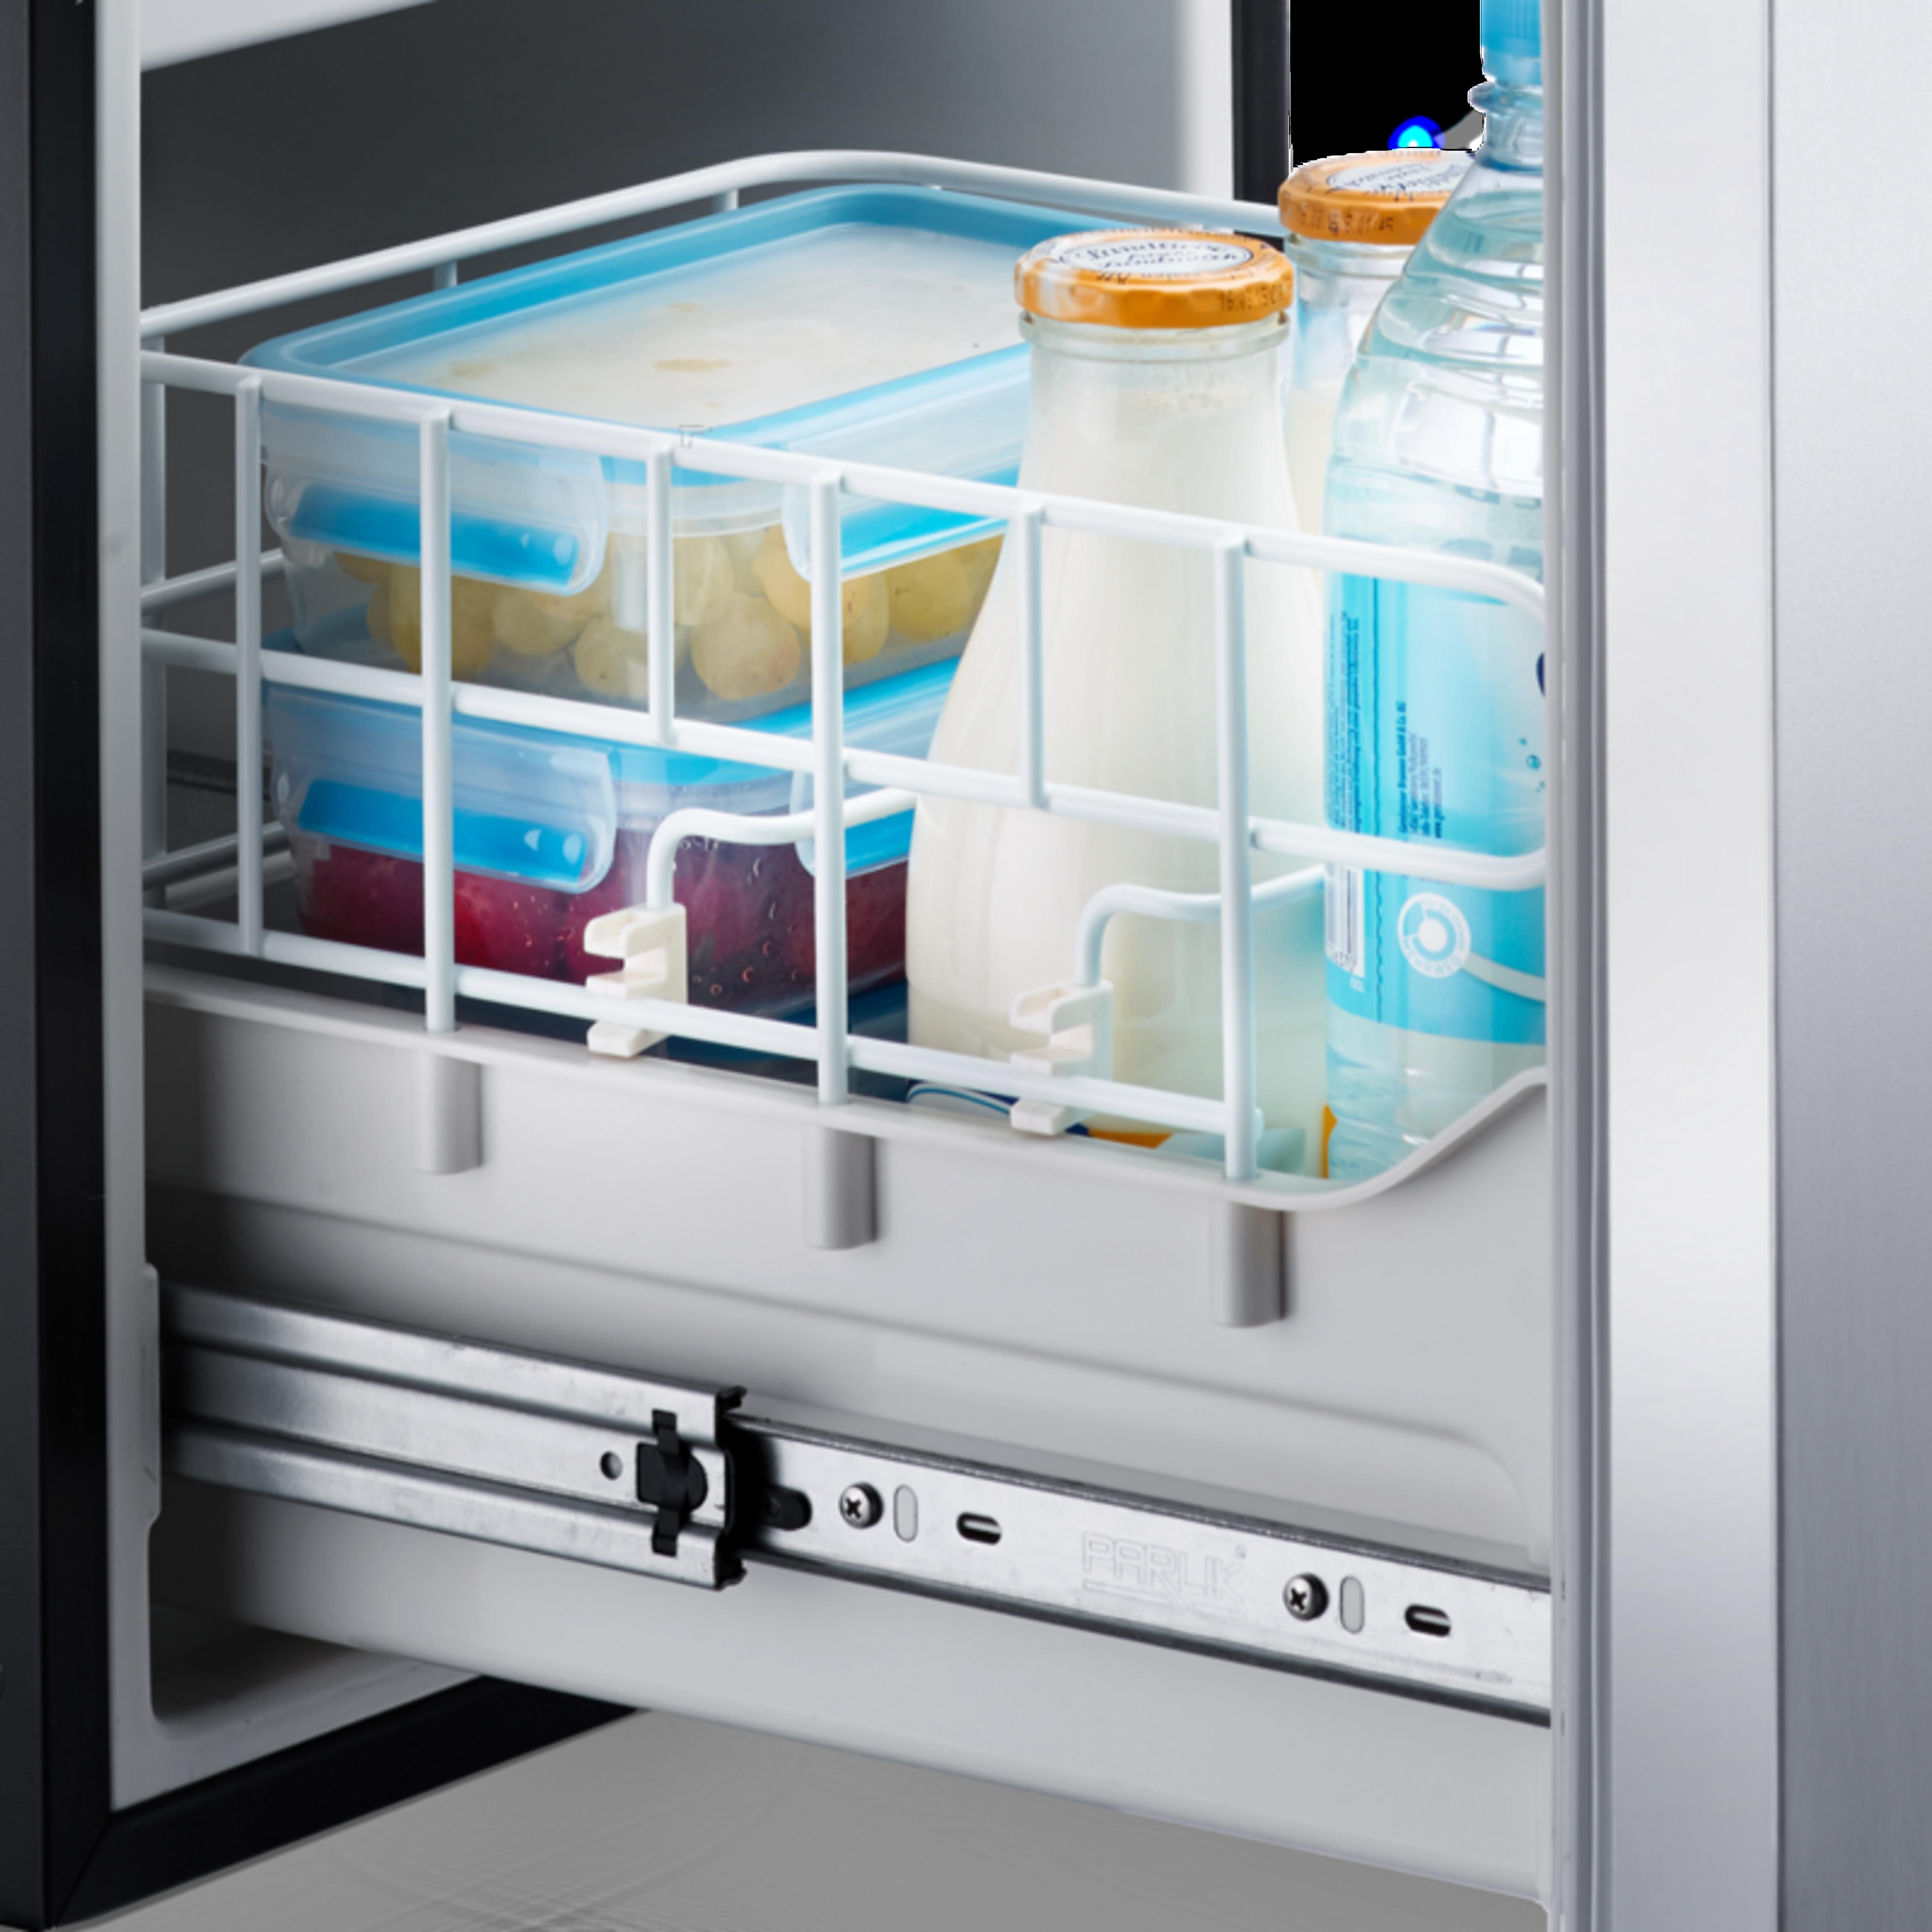 Drawer fridge